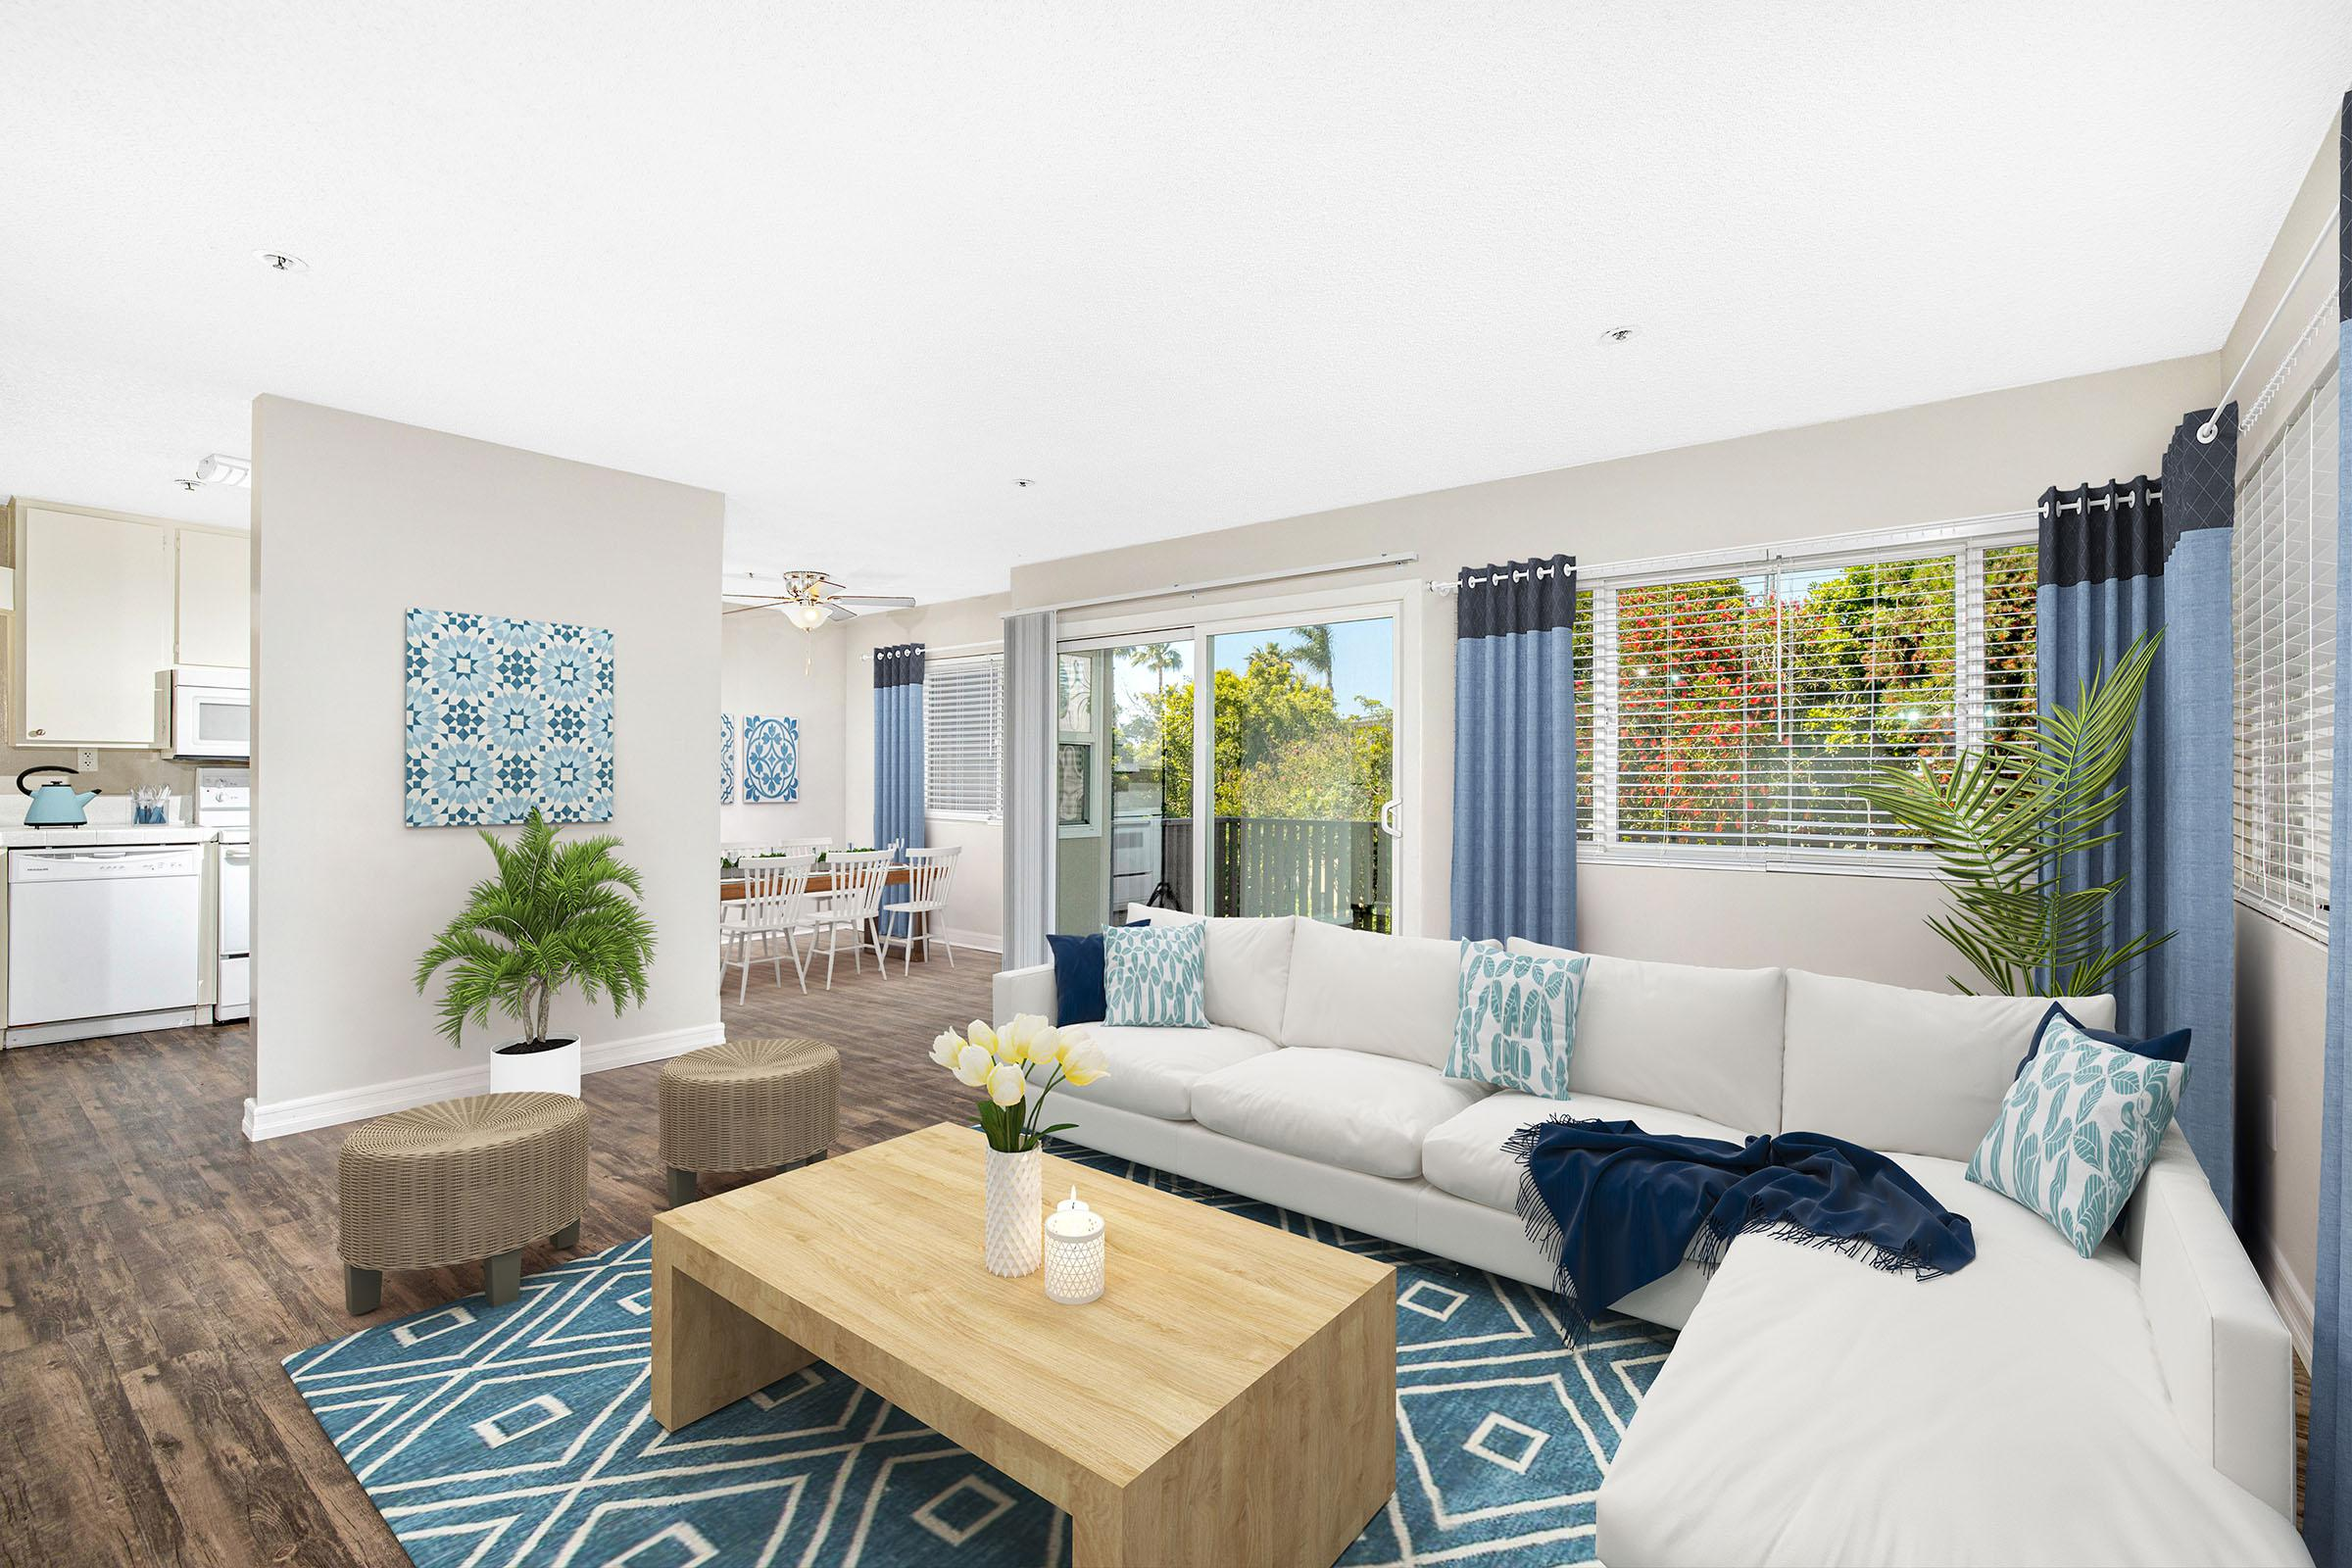 Stunning layouts at Casa Hermosa in San Diego, California